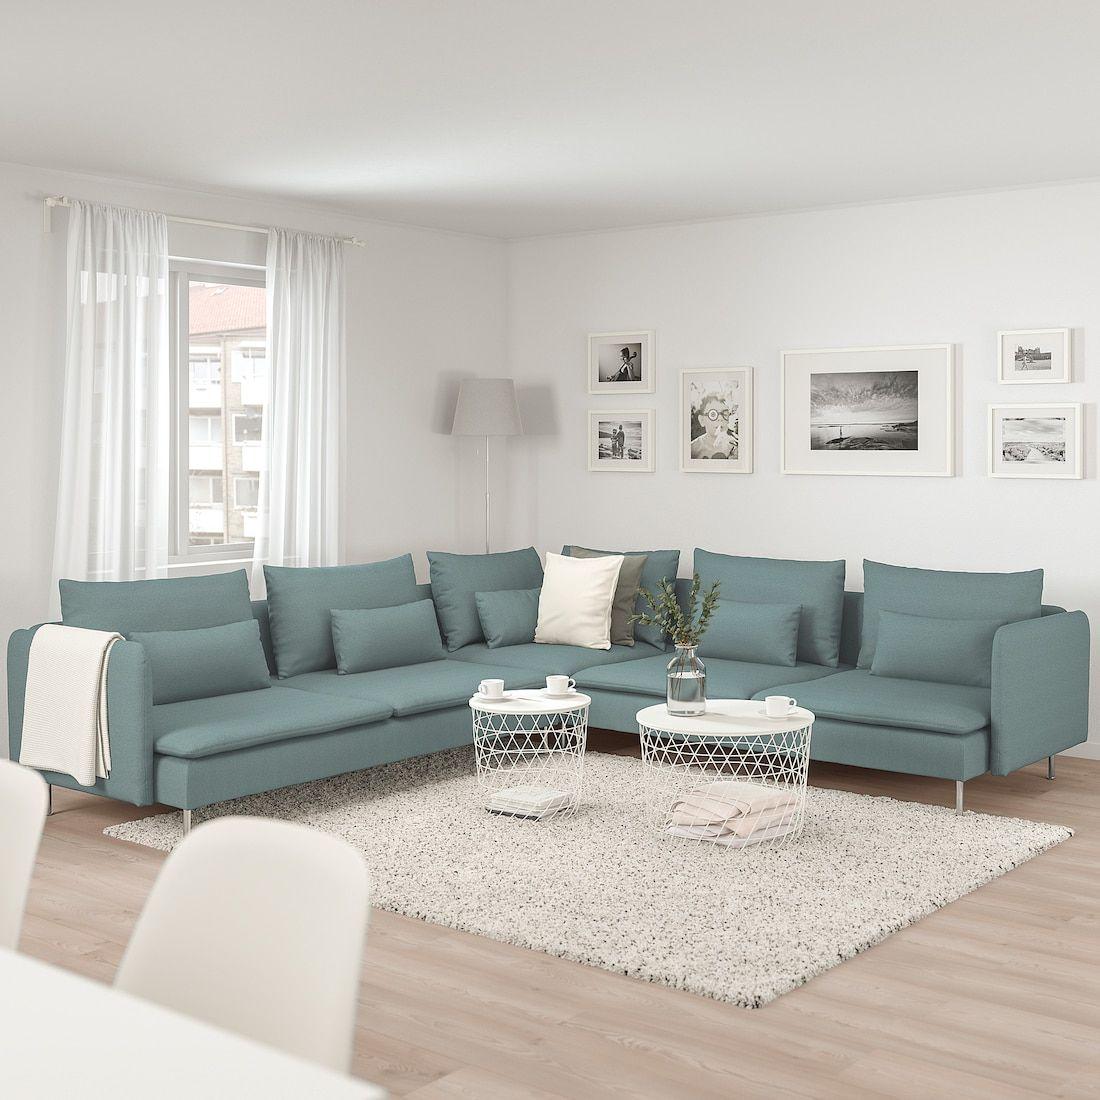 Soderhamn Sectional 5 Seat Finnsta Turquoise Small Living